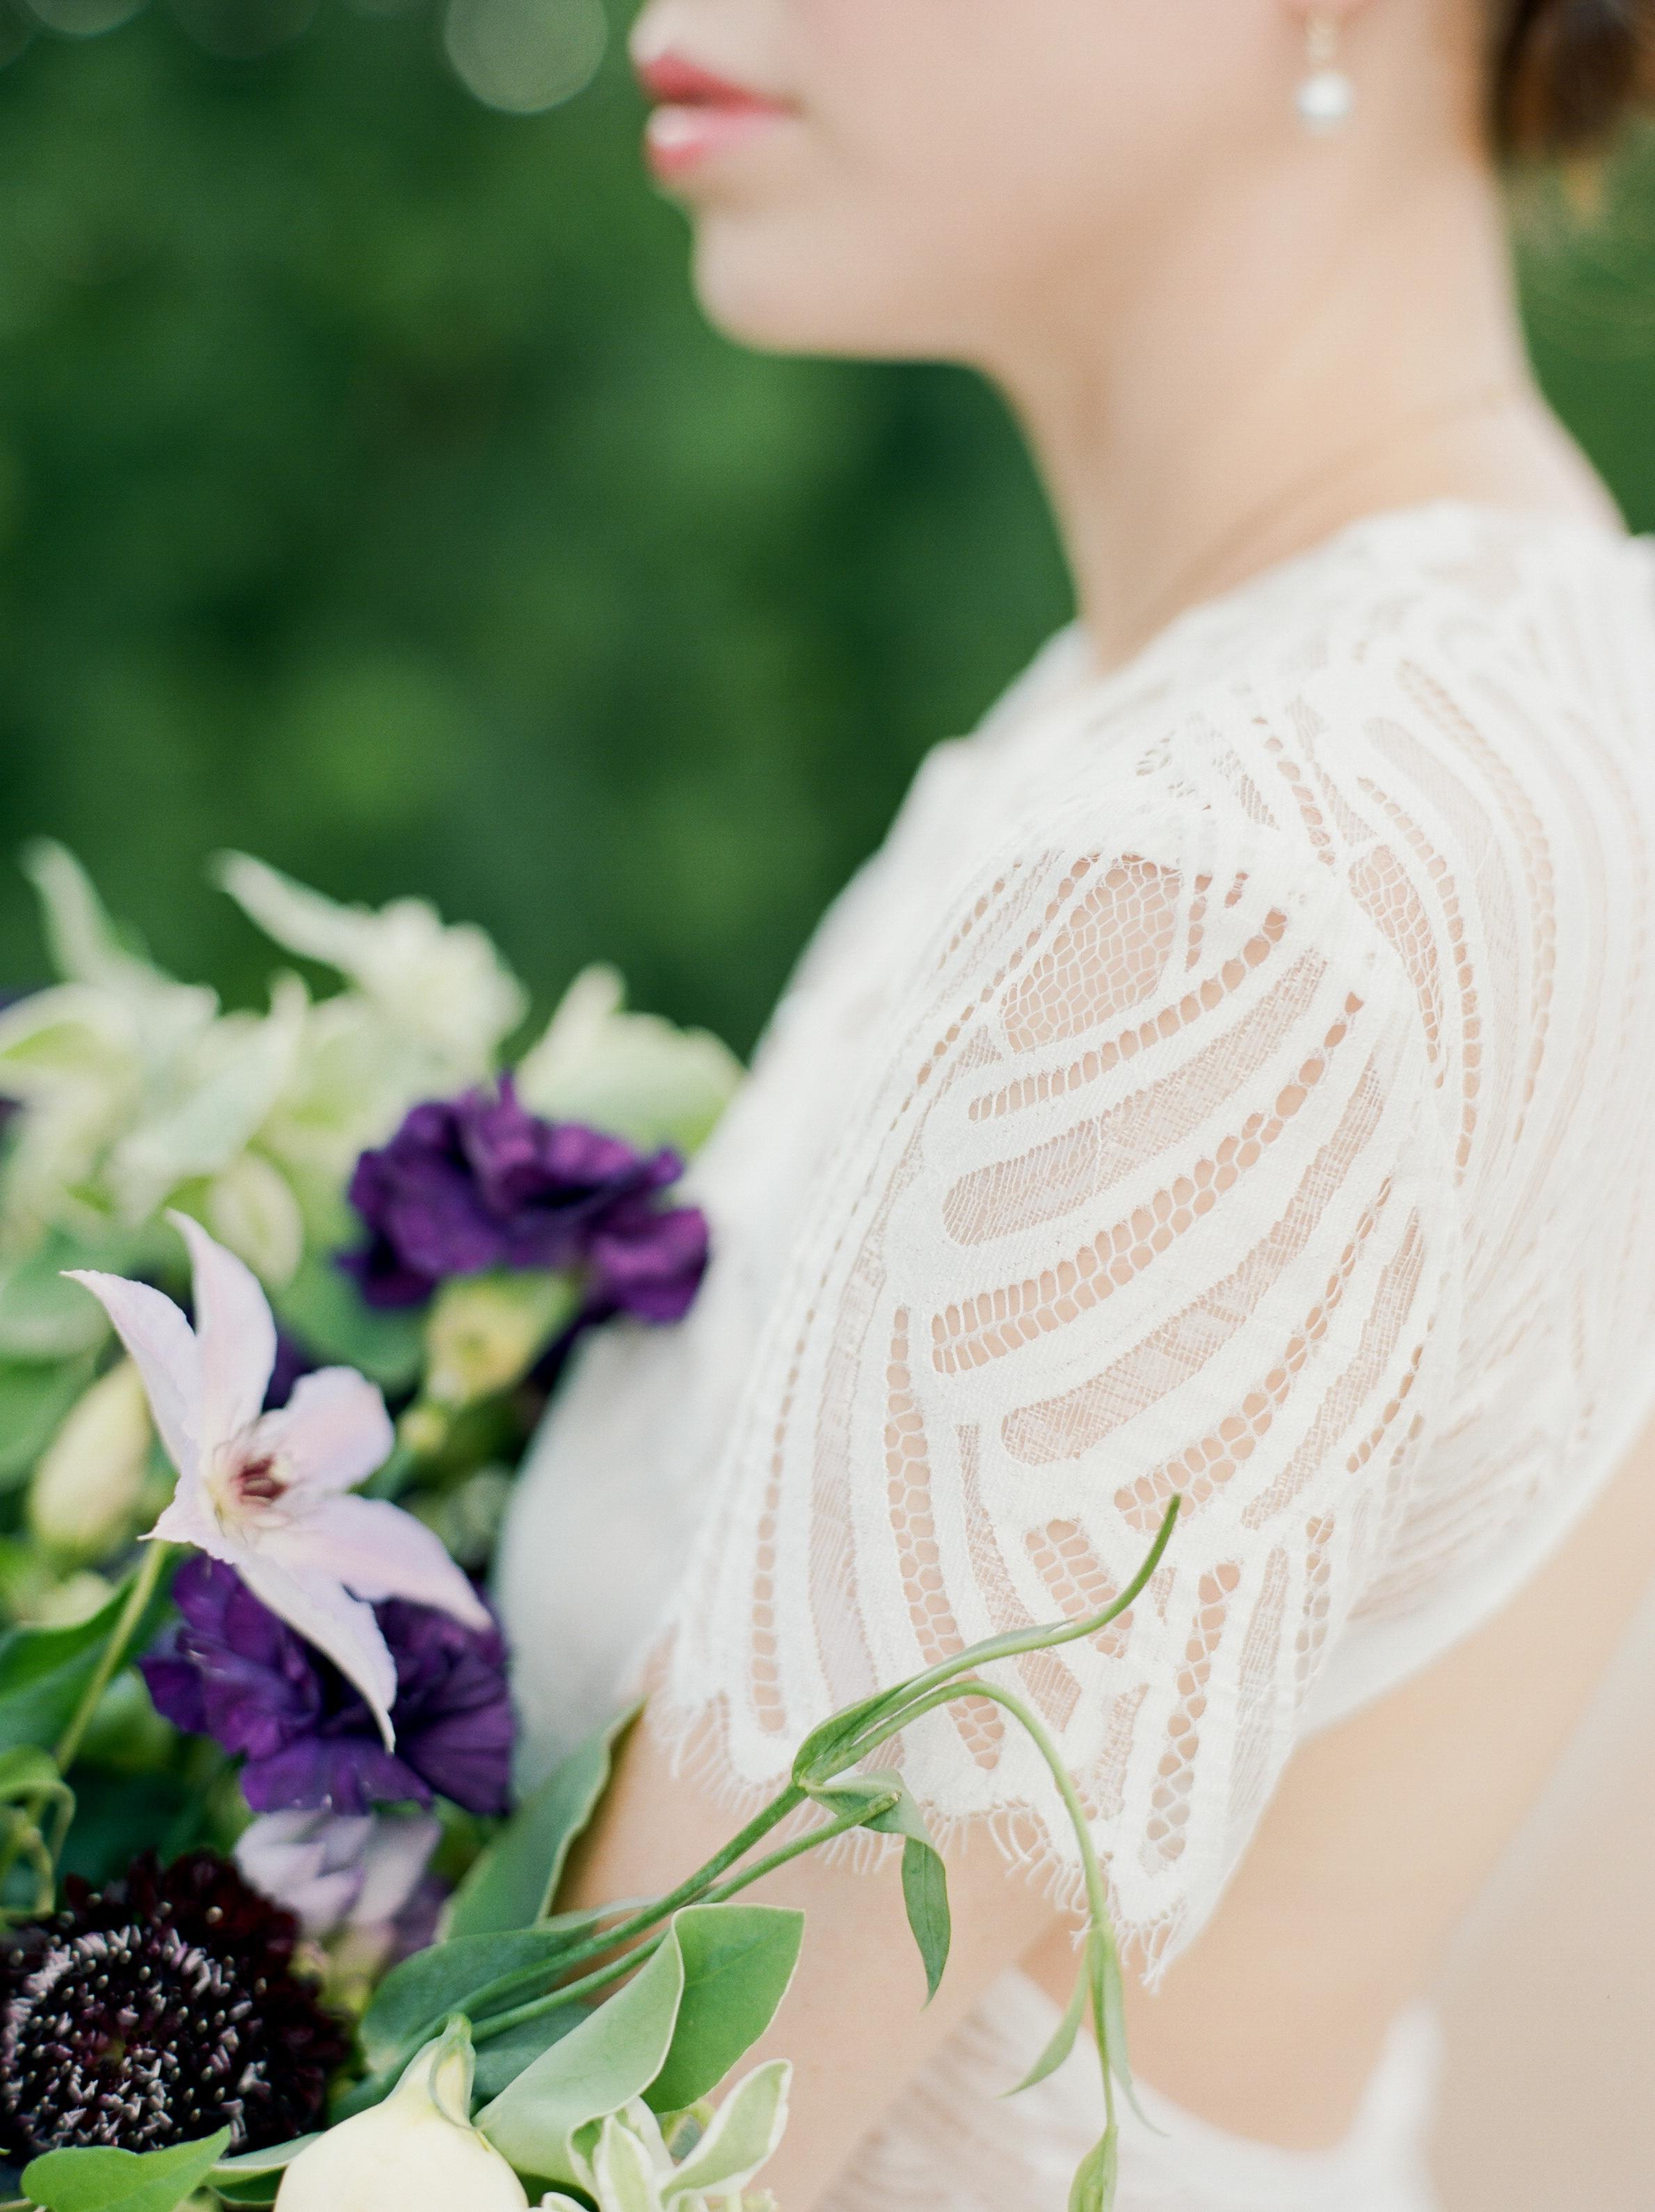 mcgovern-centennial-gardens-wedding-houston-wedding-photographer-bridals-film-austin-wedding-photographer-13.jpg